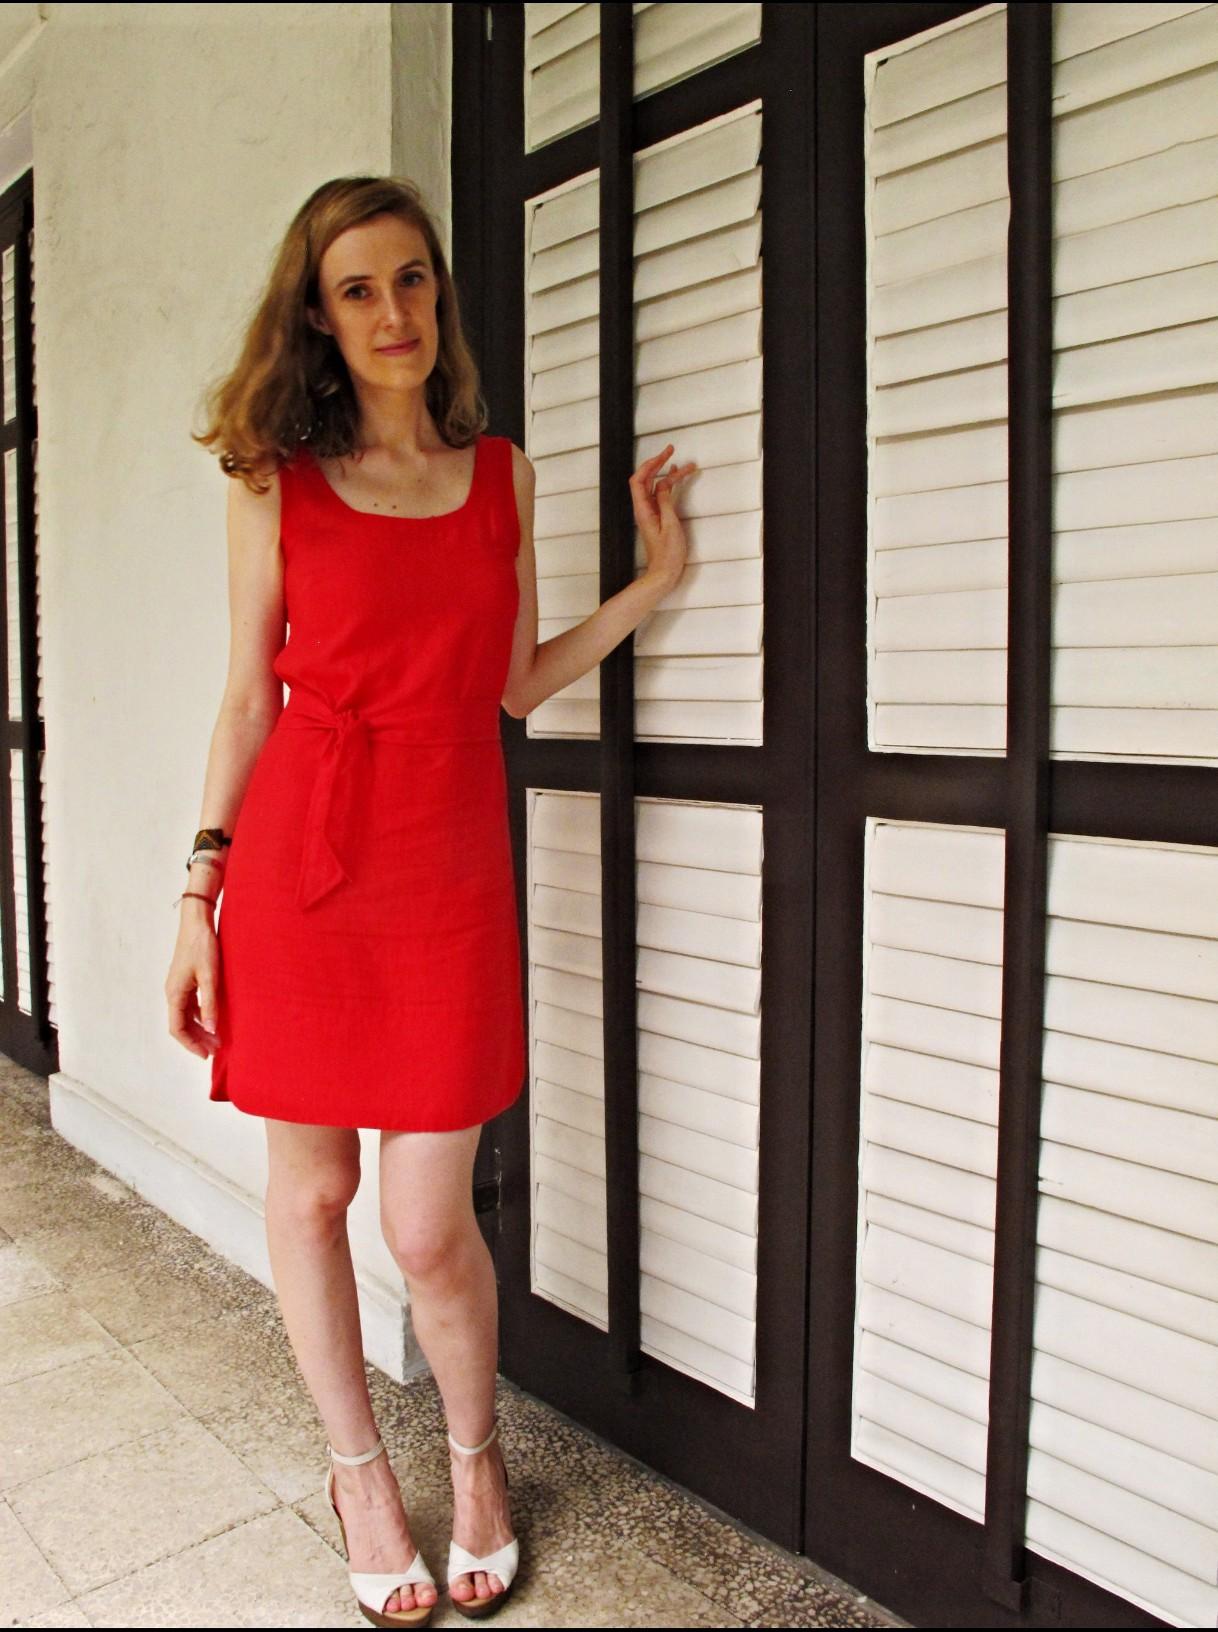 la petite robe rouge robes populaires mod les 2018. Black Bedroom Furniture Sets. Home Design Ideas